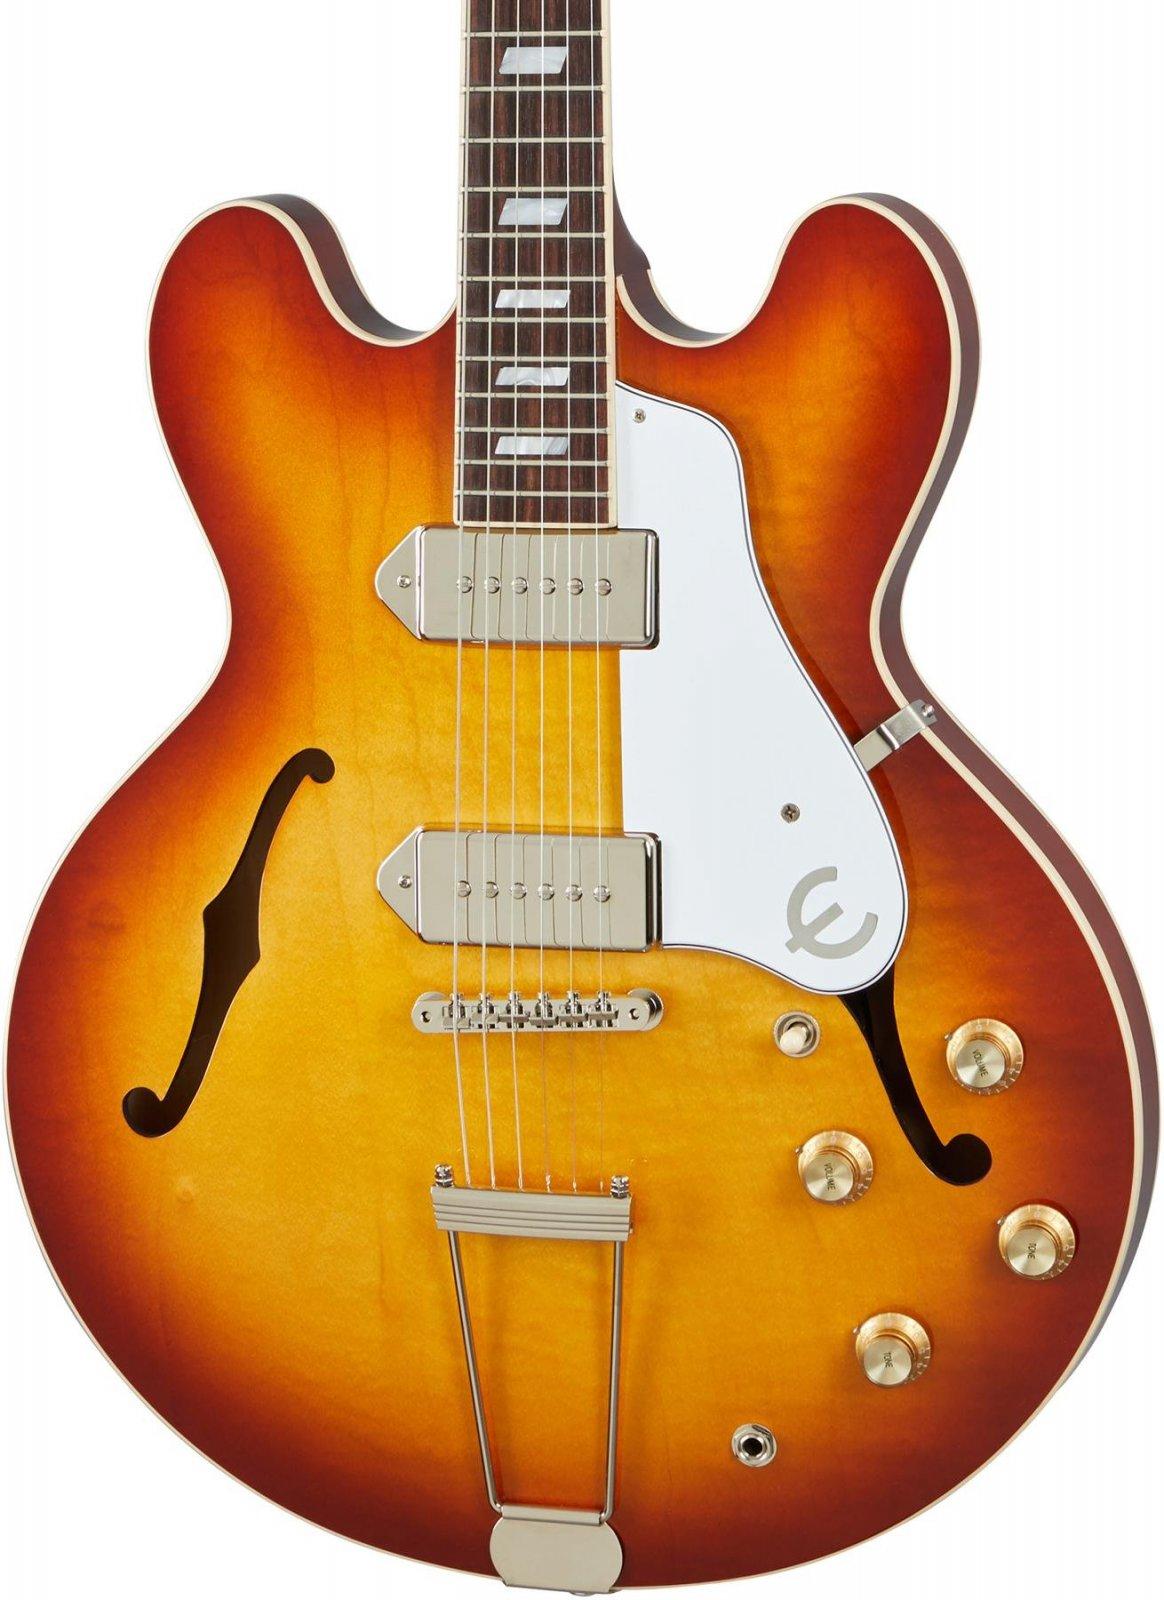 Epiphone Made in USA Casino Royal Tan Hollowbody Guitar